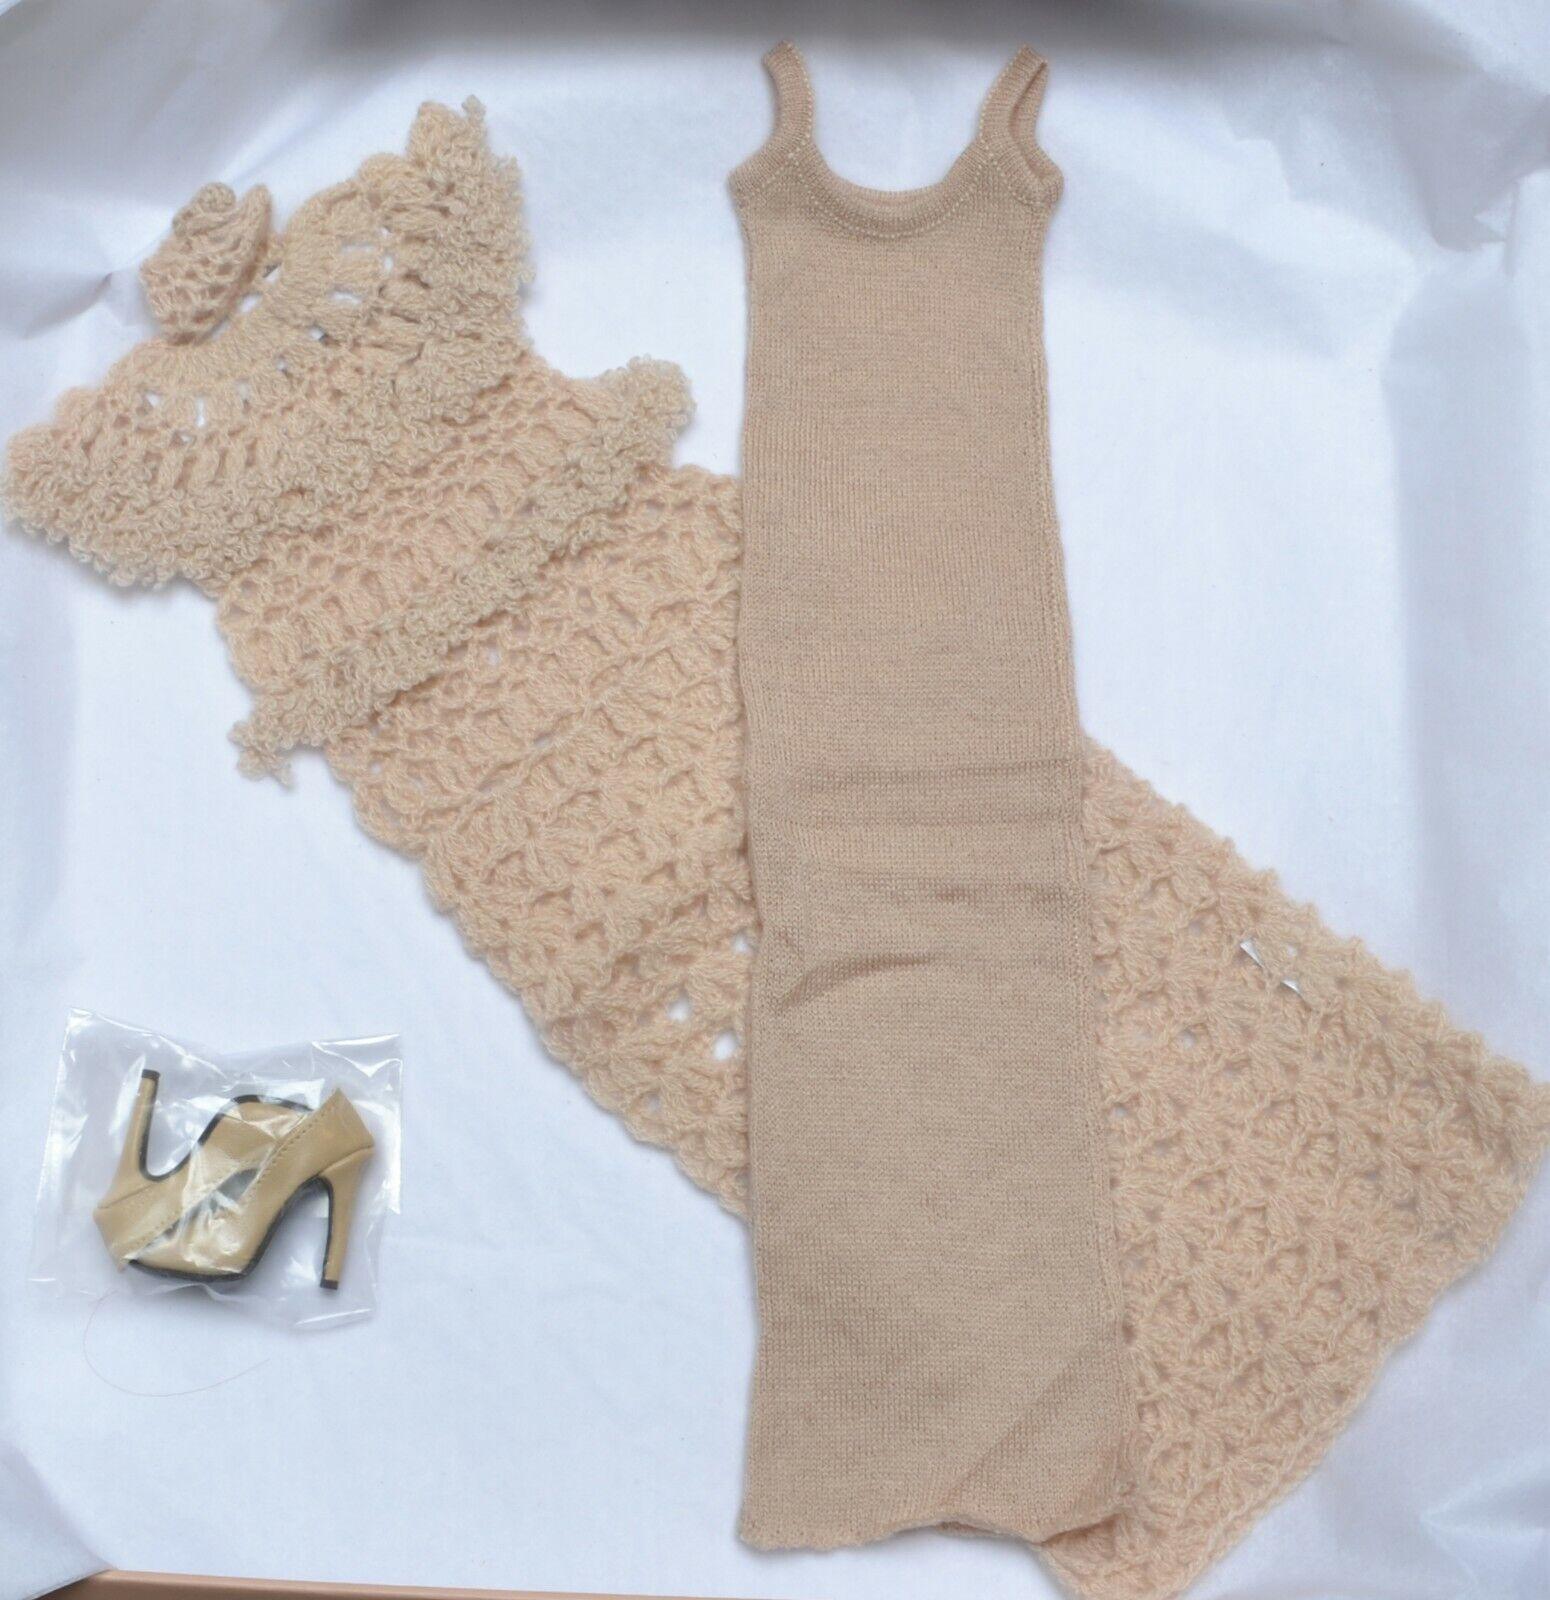 Ryan Roche 16  LOOK   2 Crocheted Kleid Tonner NRFB NEW Phyn & Aero